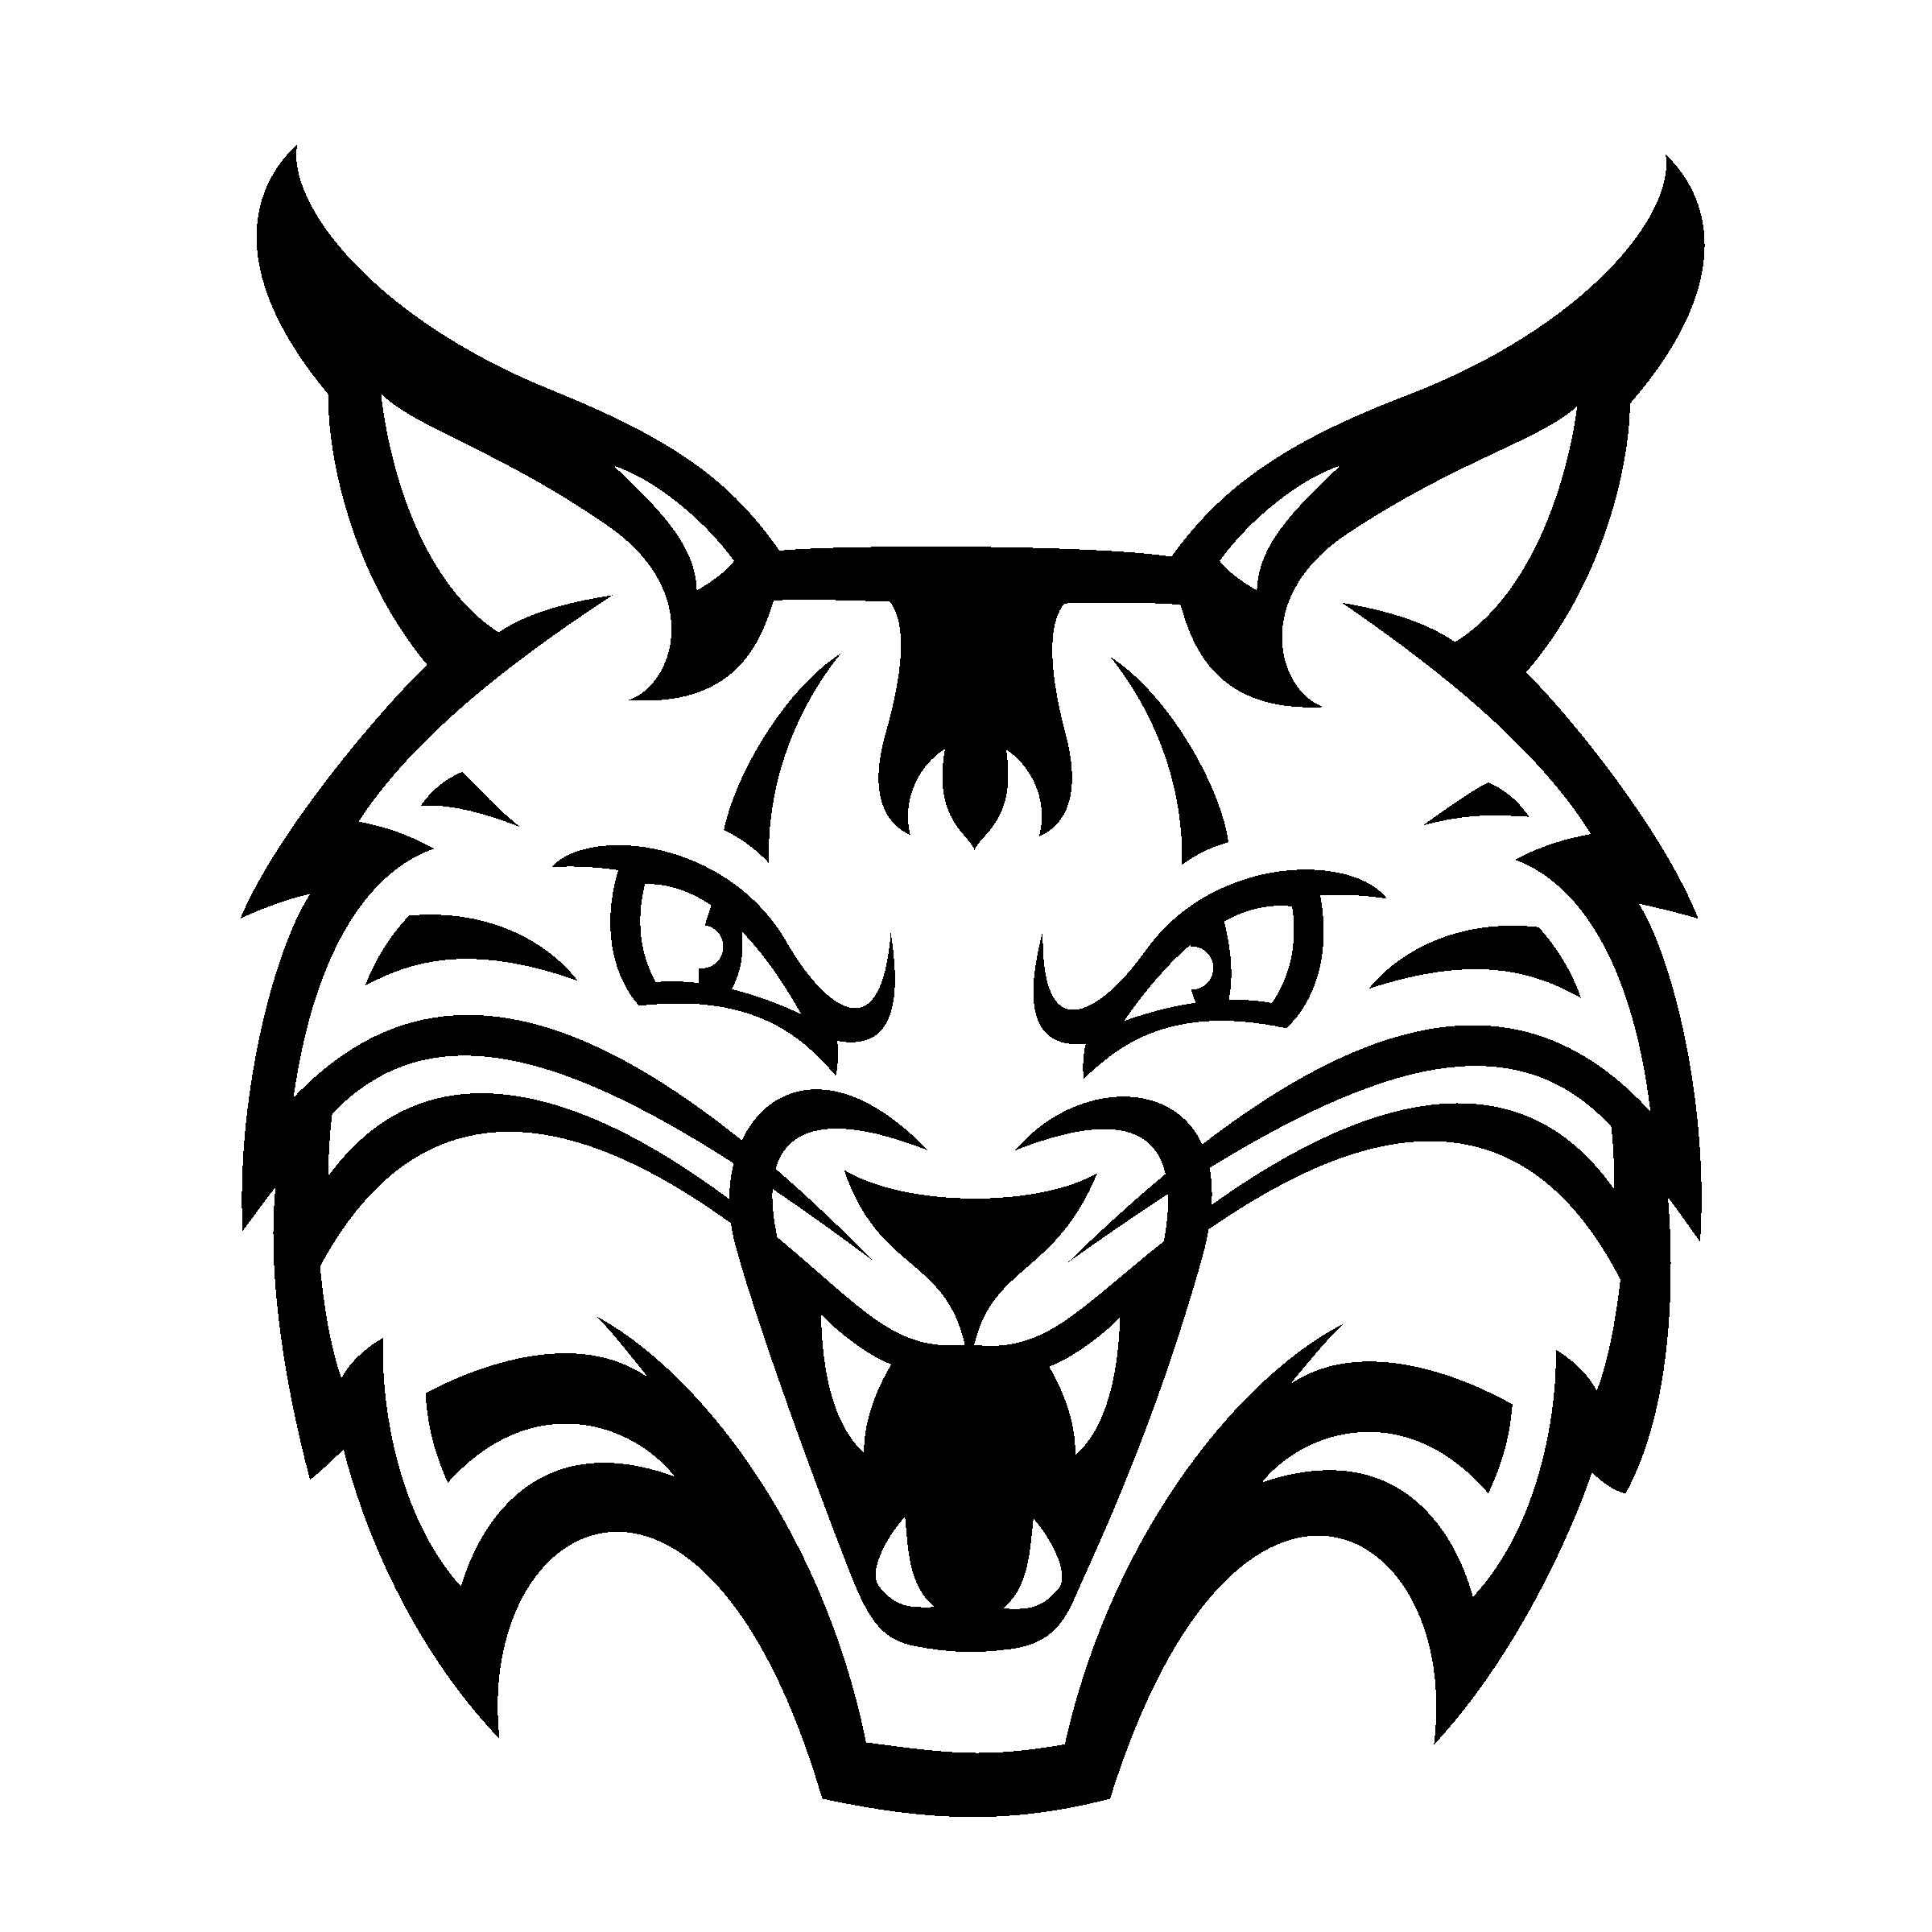 Bobcat Logo Vector At Getdrawingscom Free For Personal Use Bobcat